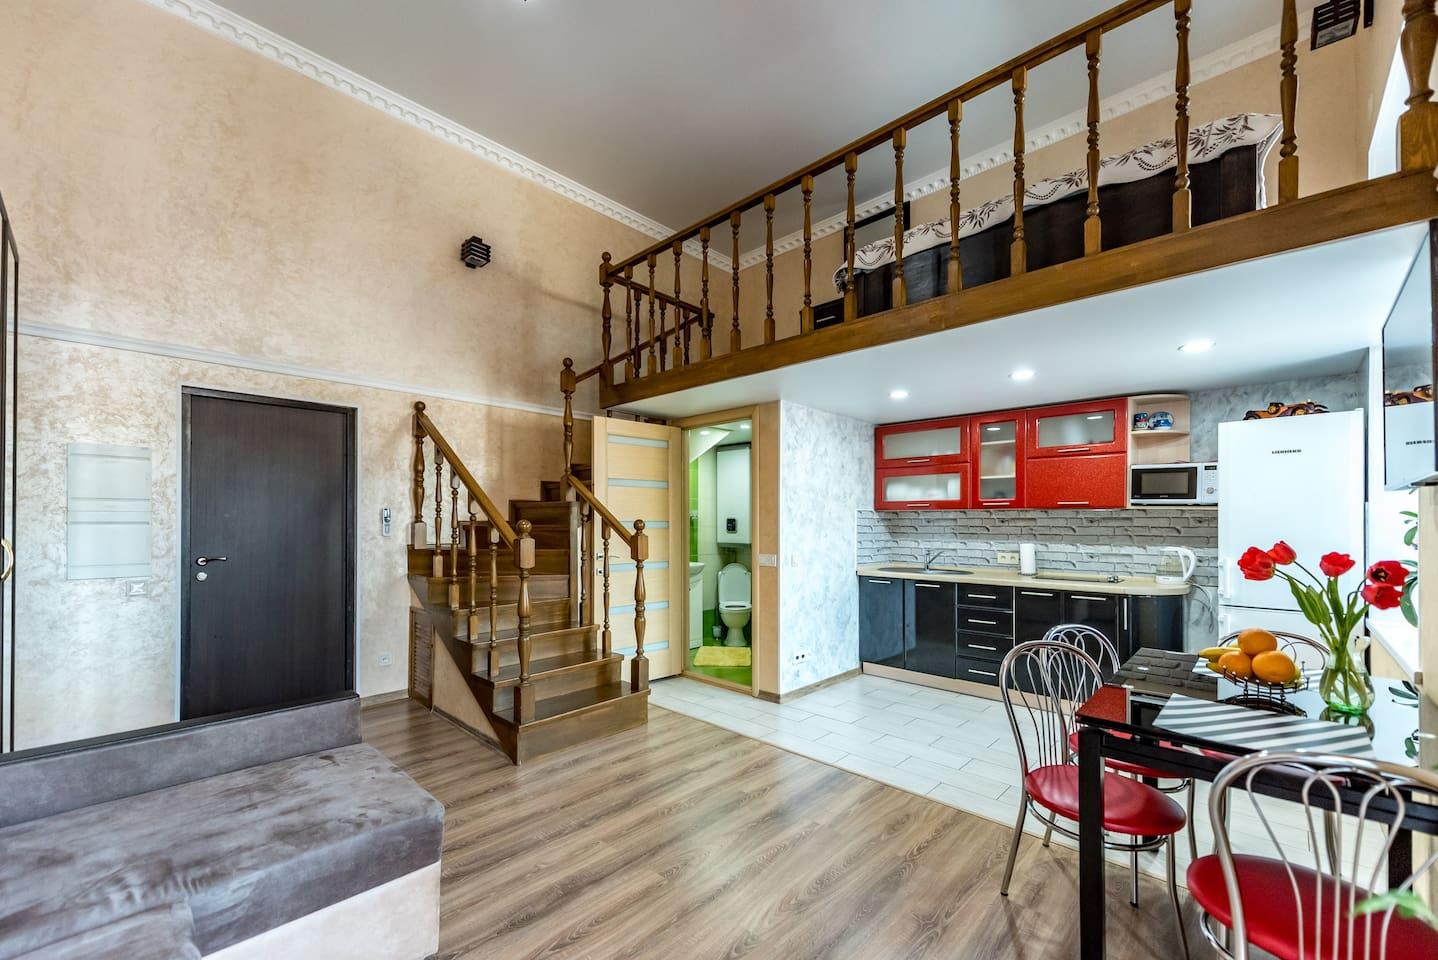 Studio apartment in the heart of Odessa